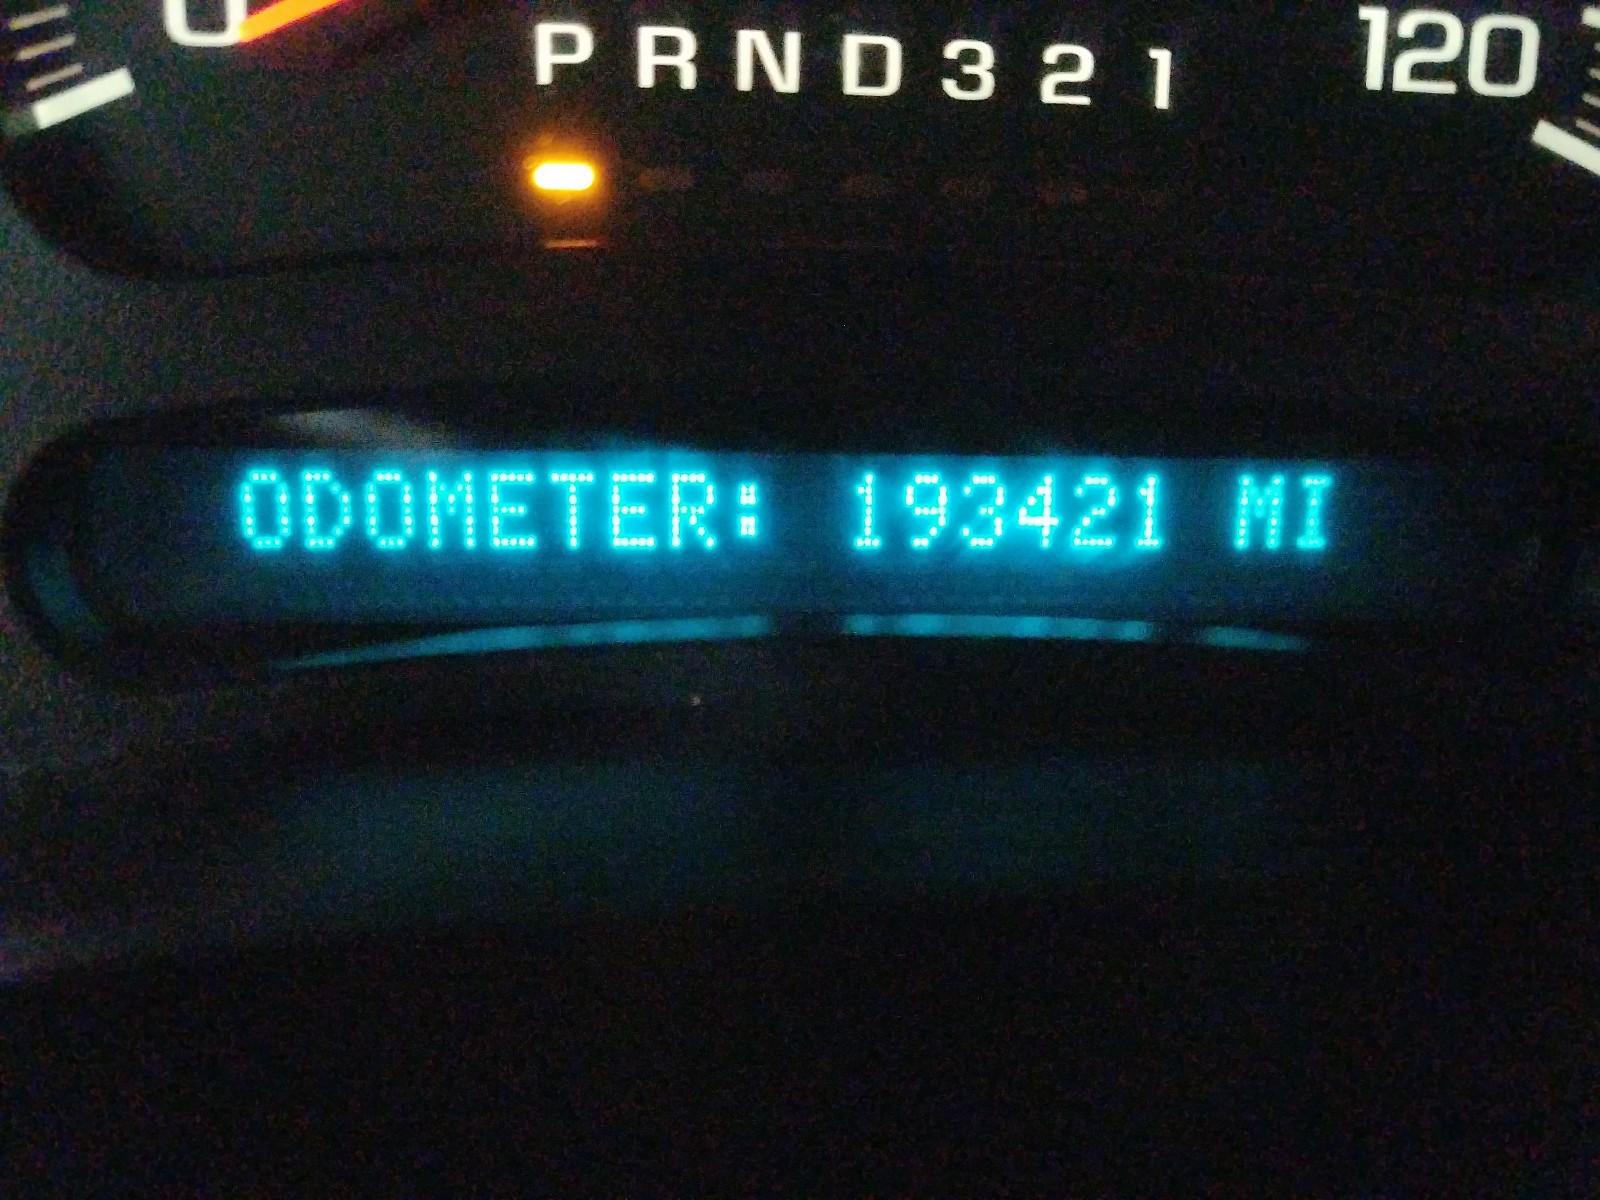 2GCEK13T861244276 - 2006 Chevrolet Silverado 5.3L front view